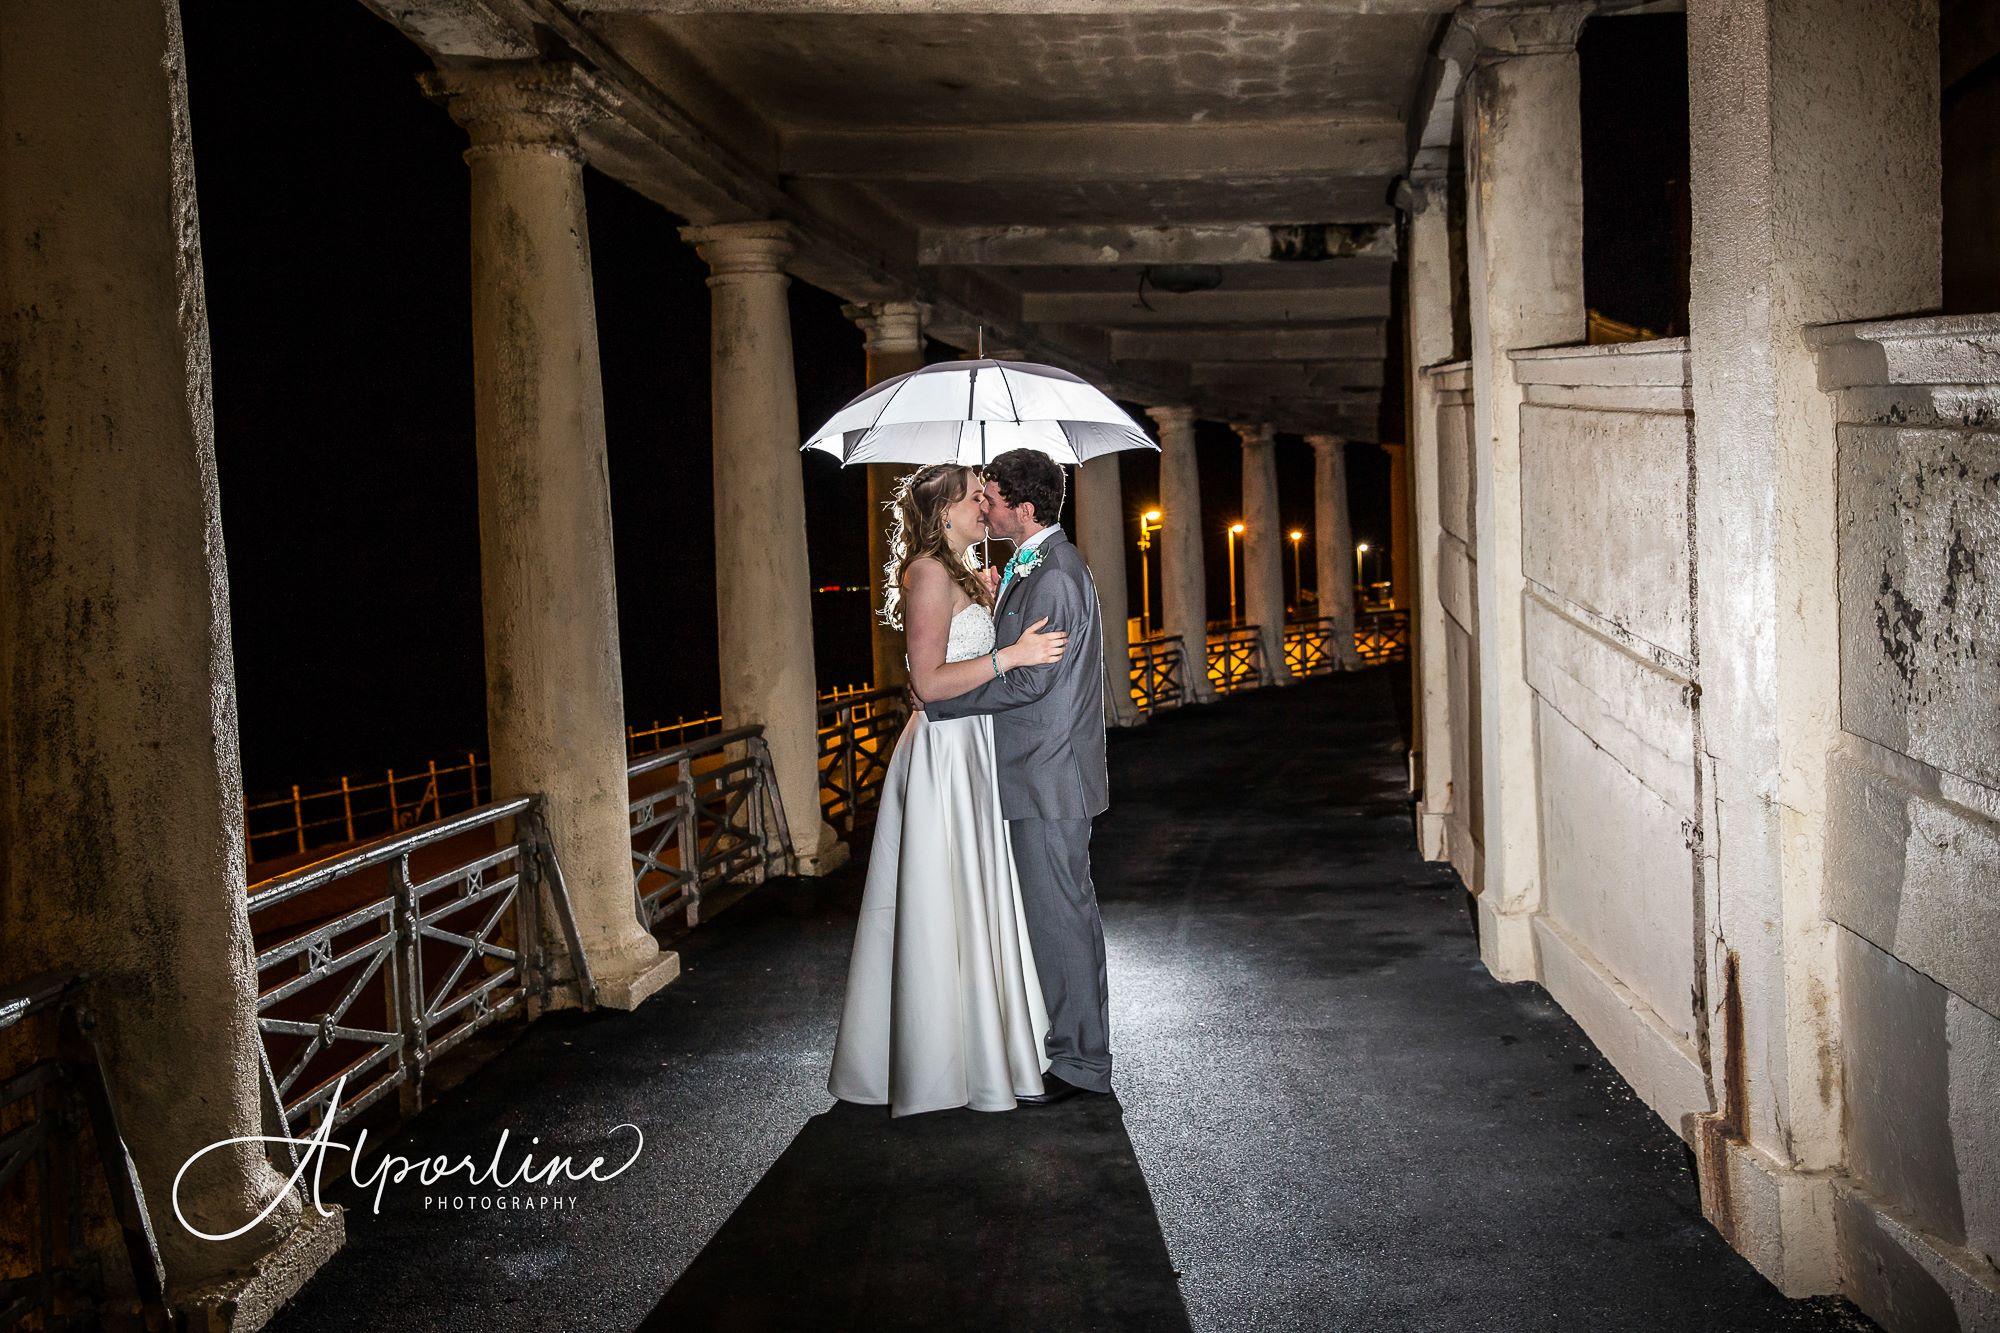 Imperial-hotel-wedding-photograph-blackpool-wedding-photographer.jpg